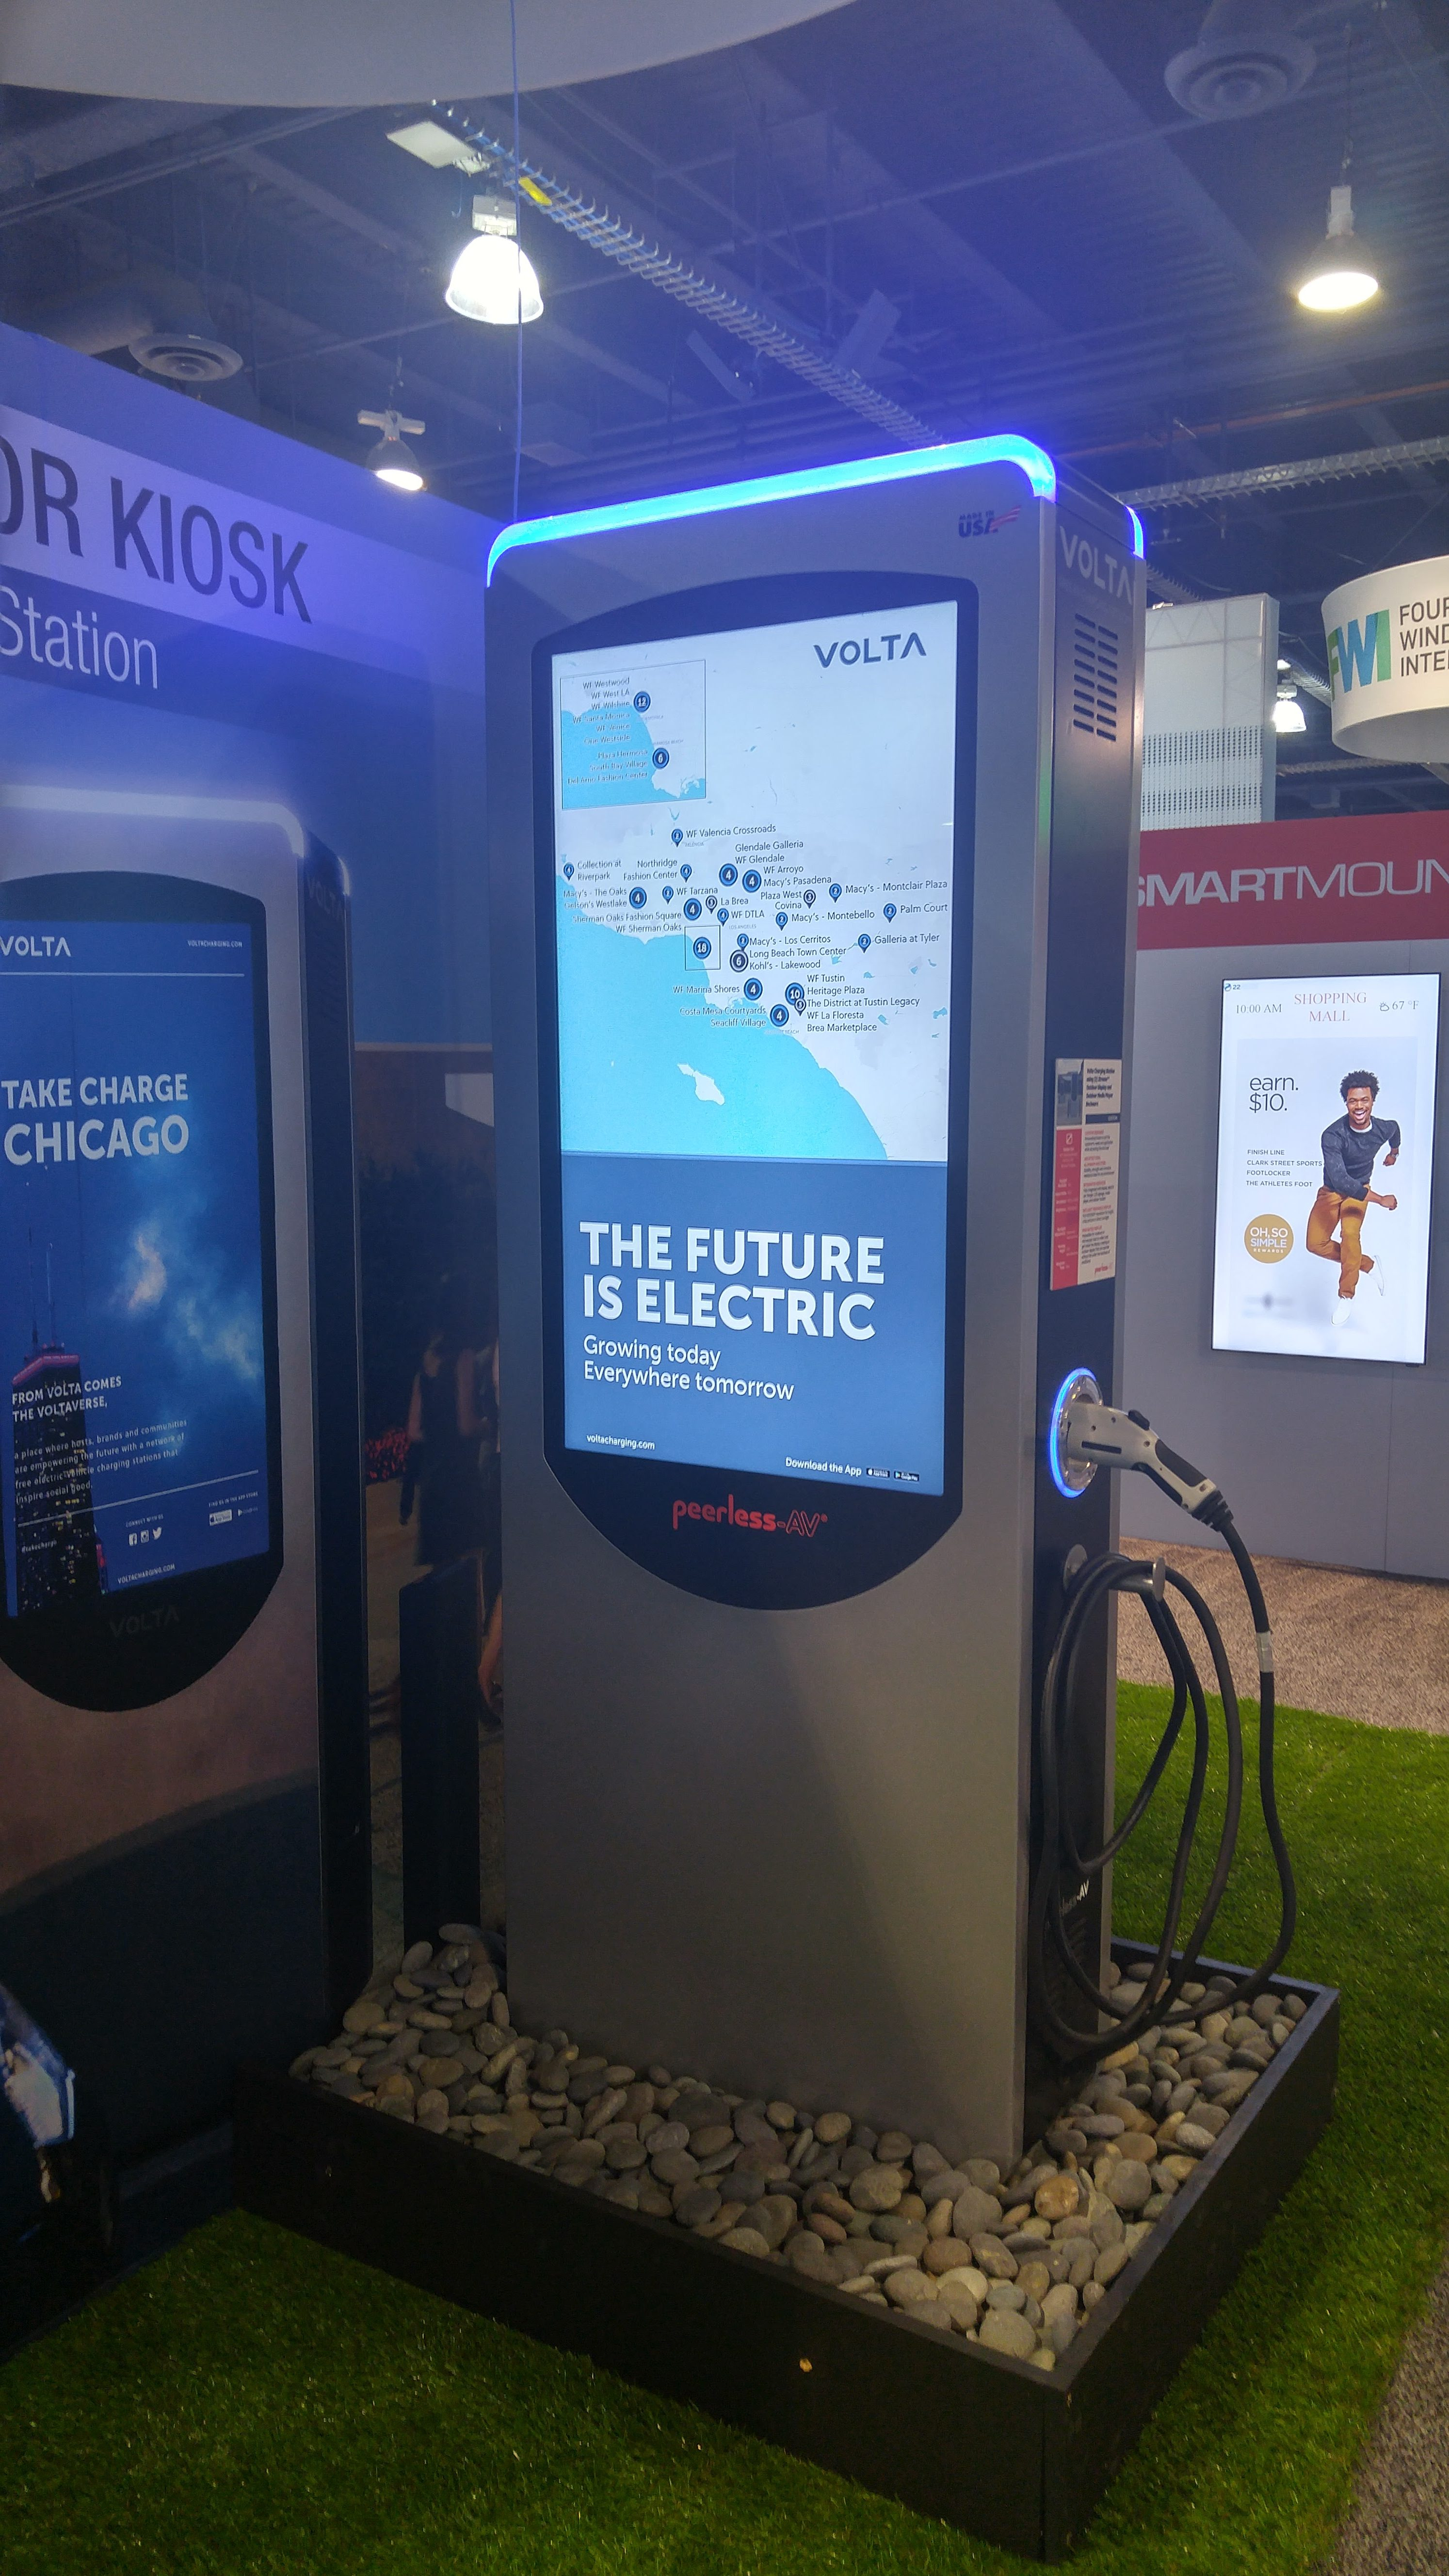 Electric Vehicle Charging Station Signage